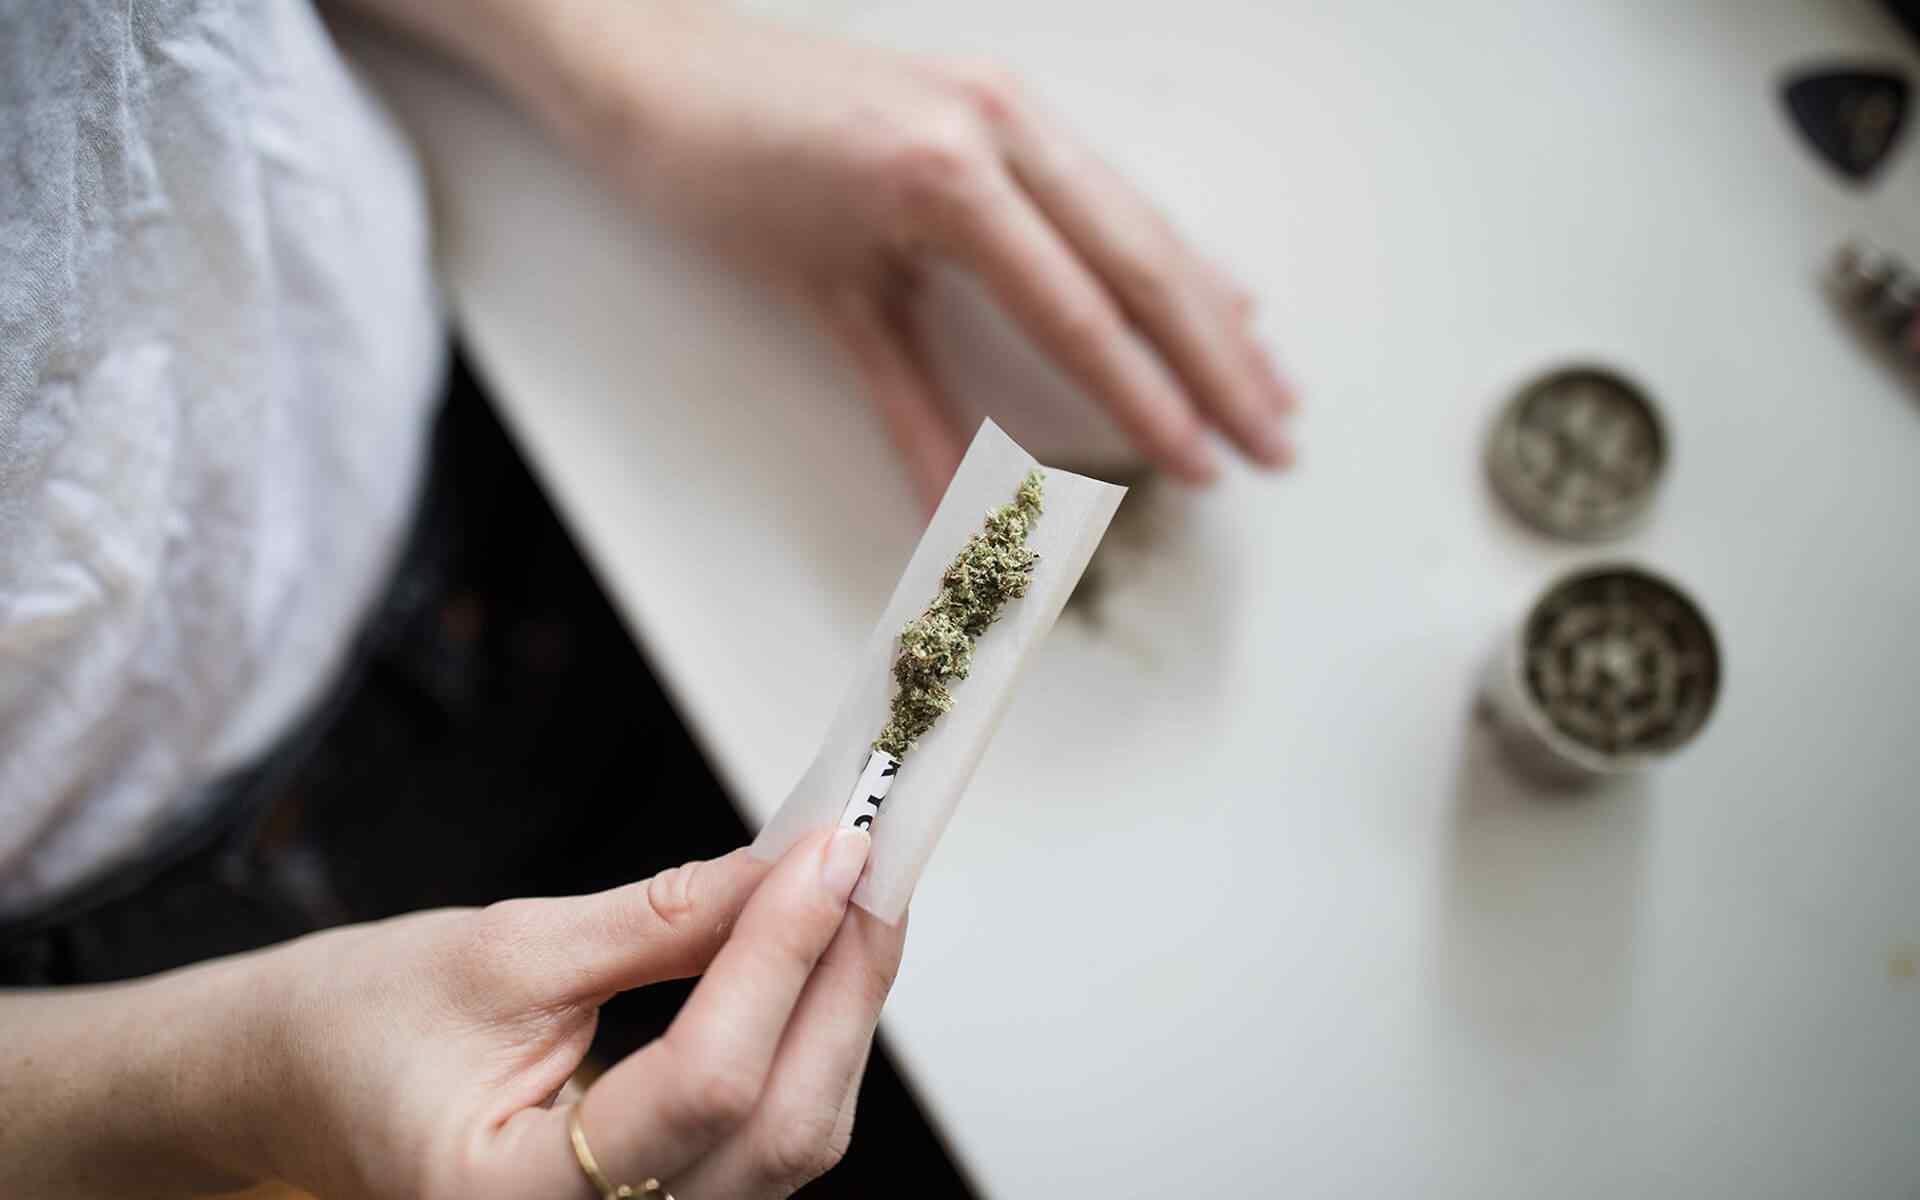 Oklahoma Governor Signs Bill for Medical Marijuana Regulations Into Law